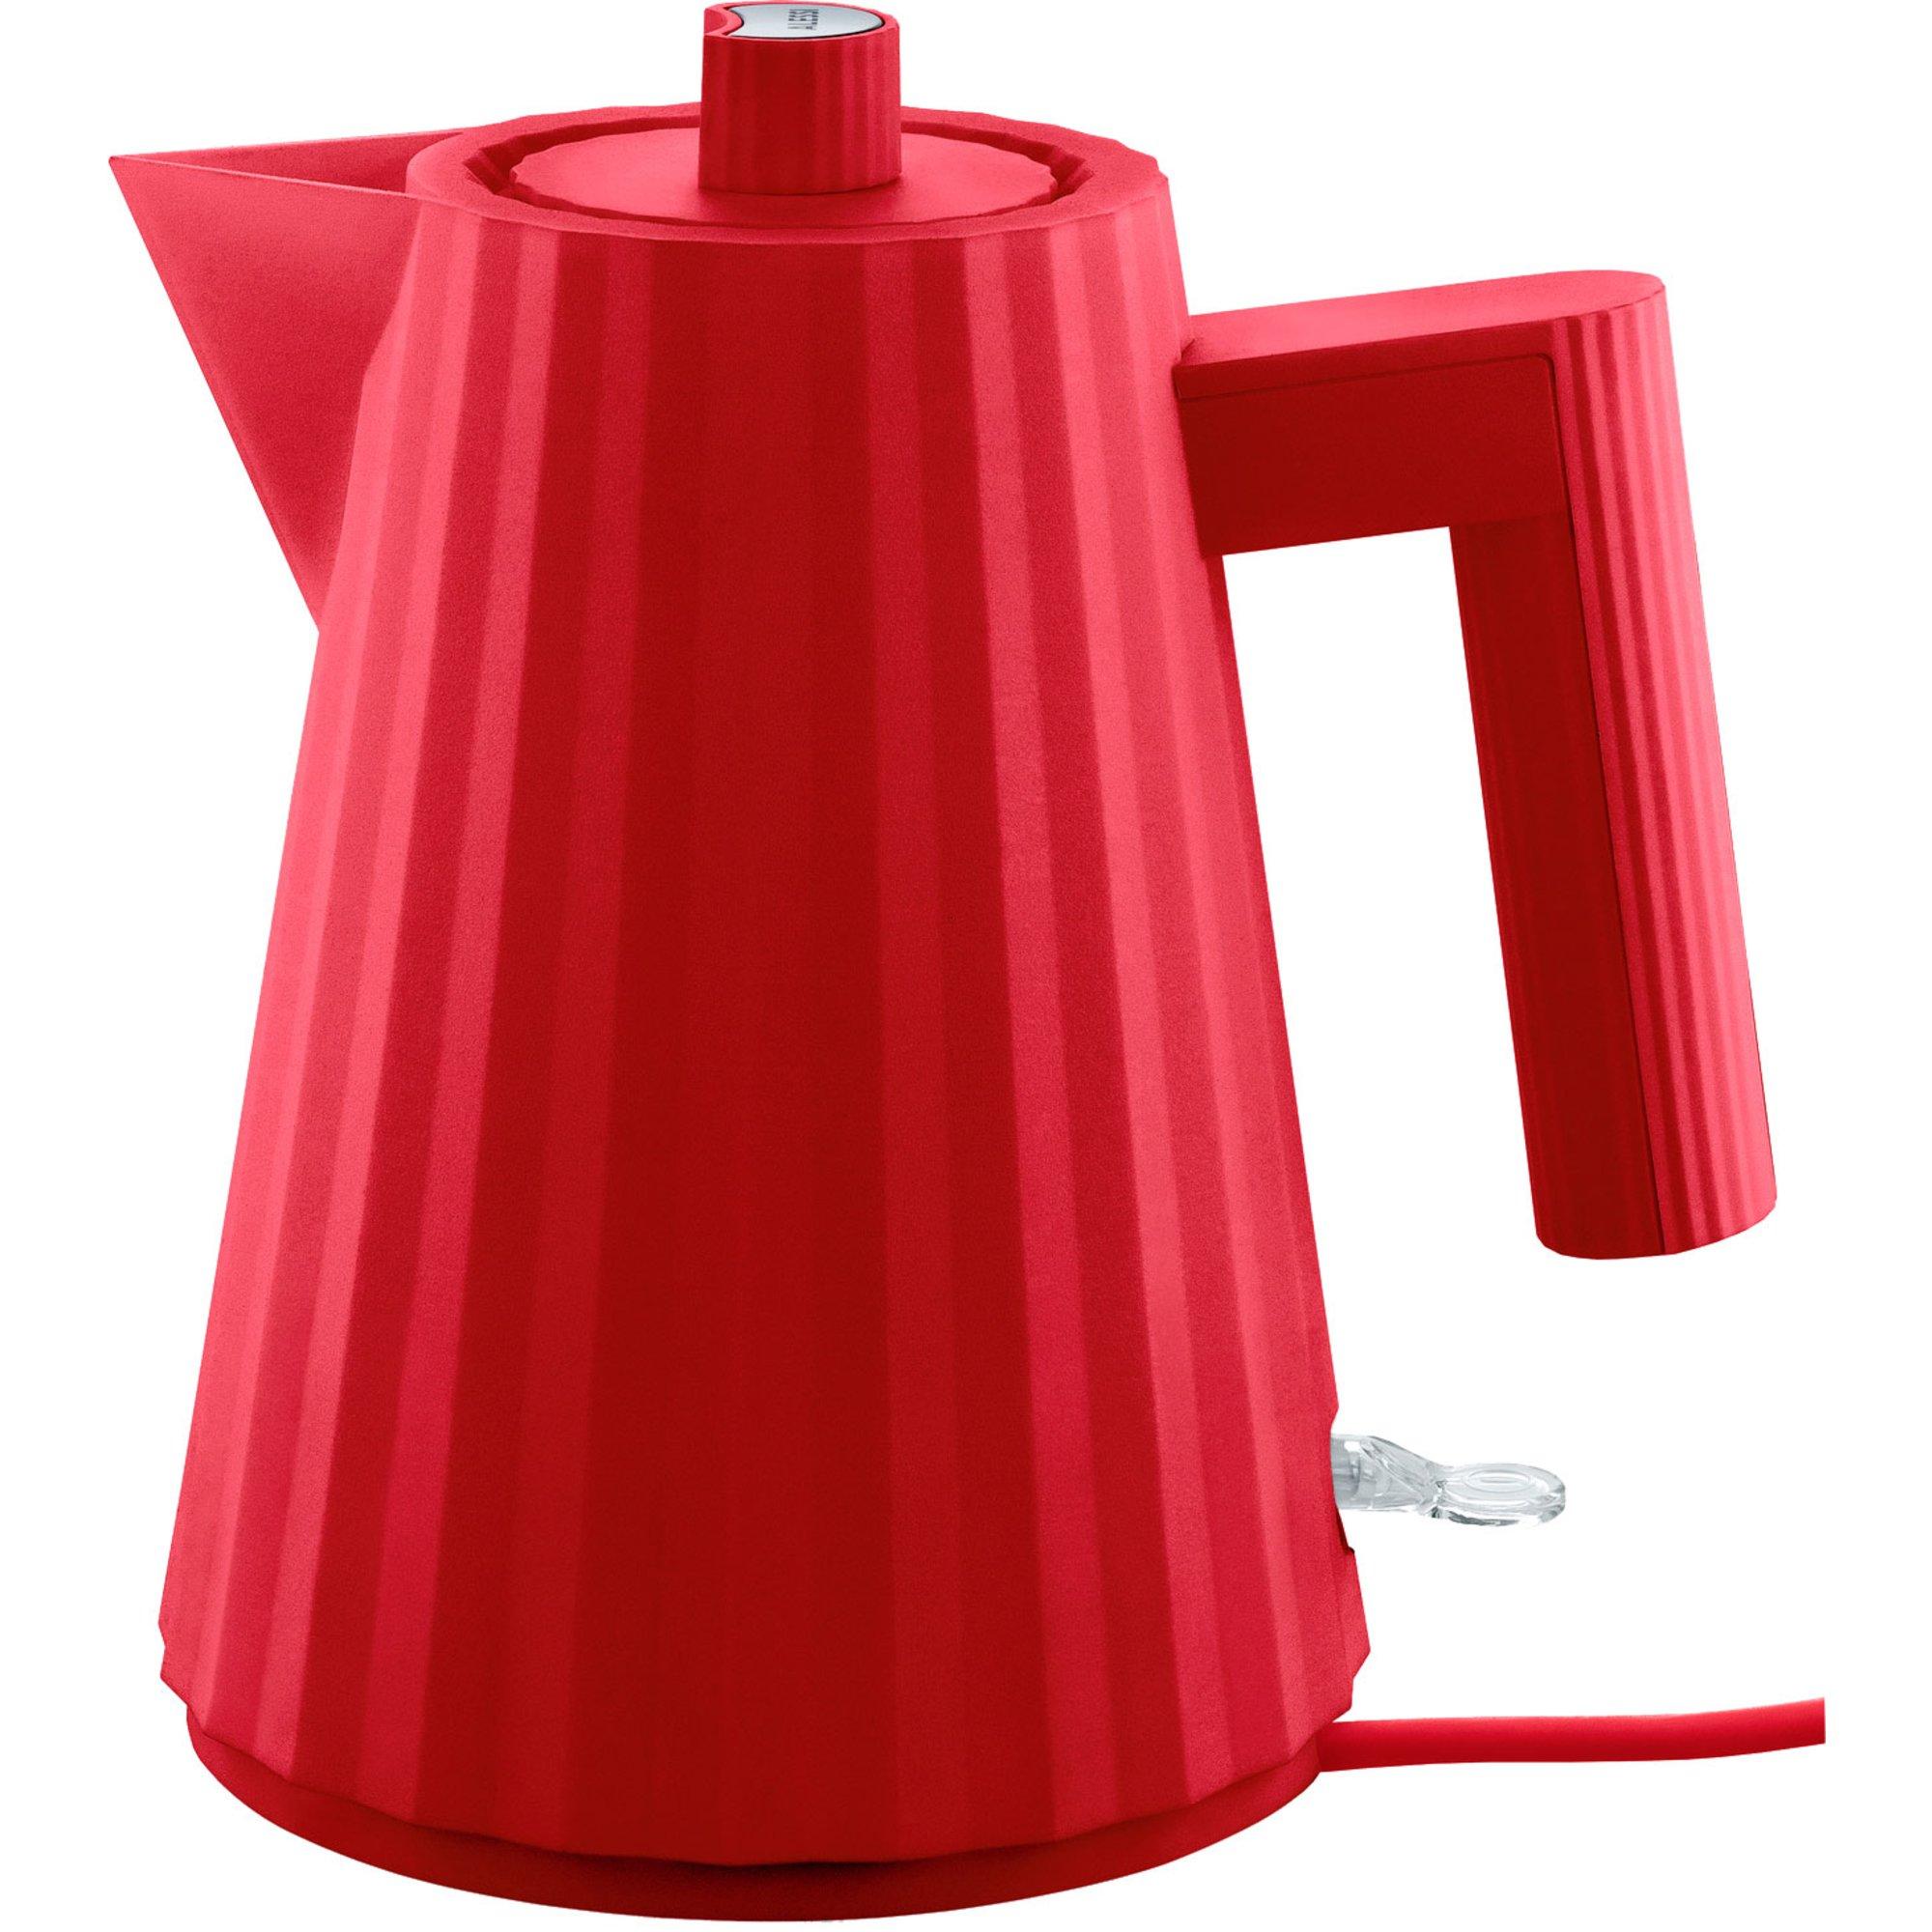 Alessi MDL06 Plissé vattenkokare 1 liter röd